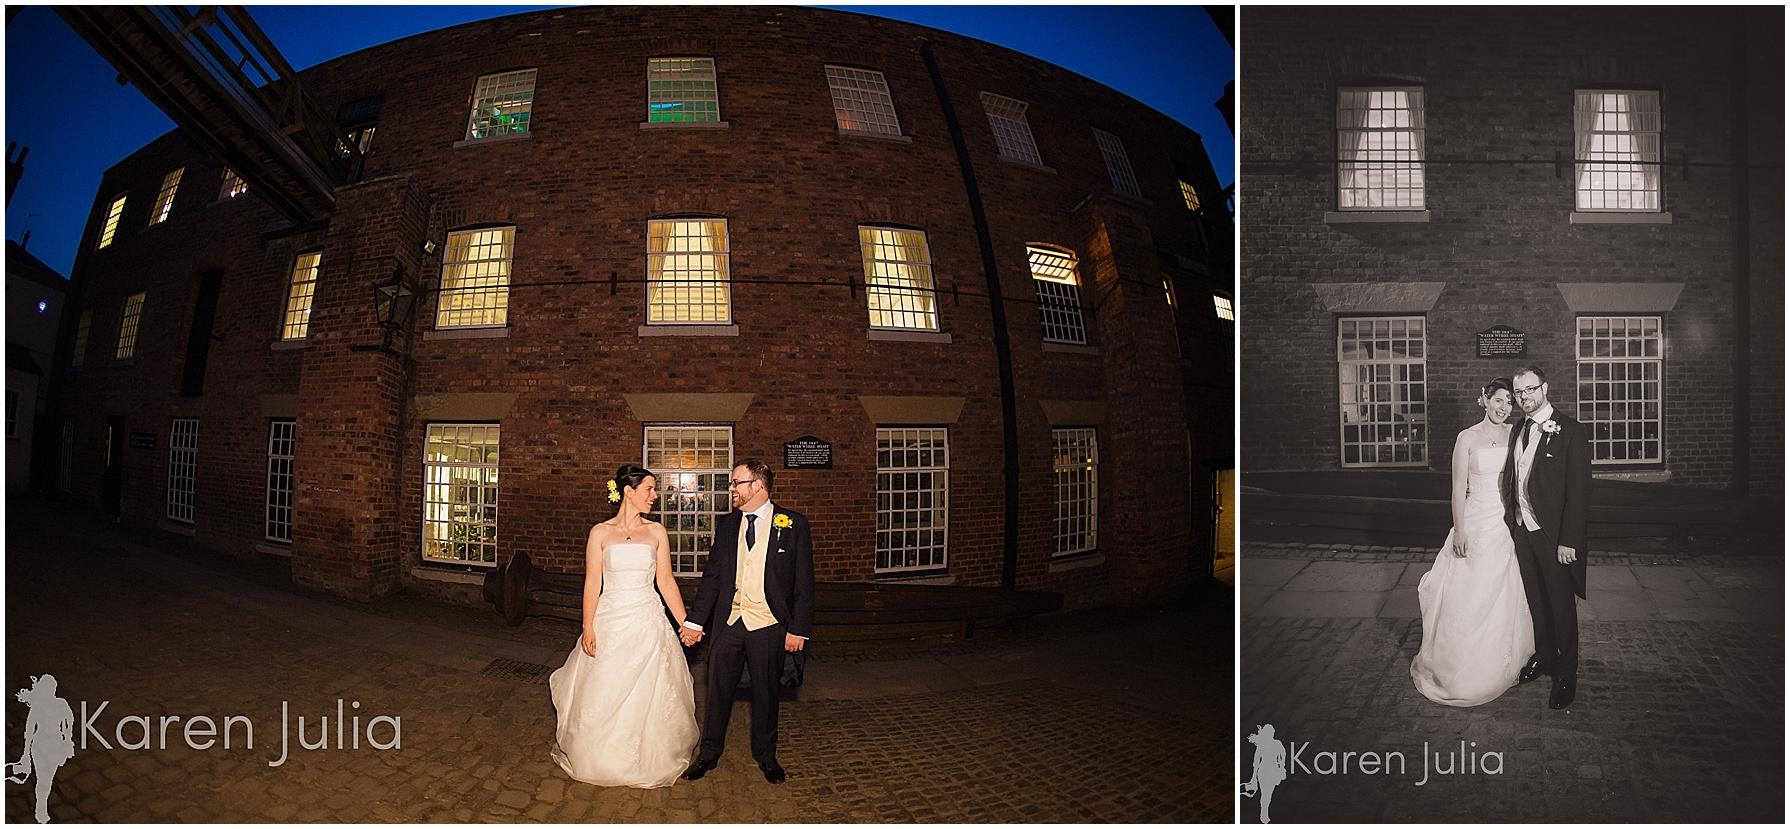 Quarry Bank Mill wedding night portrait